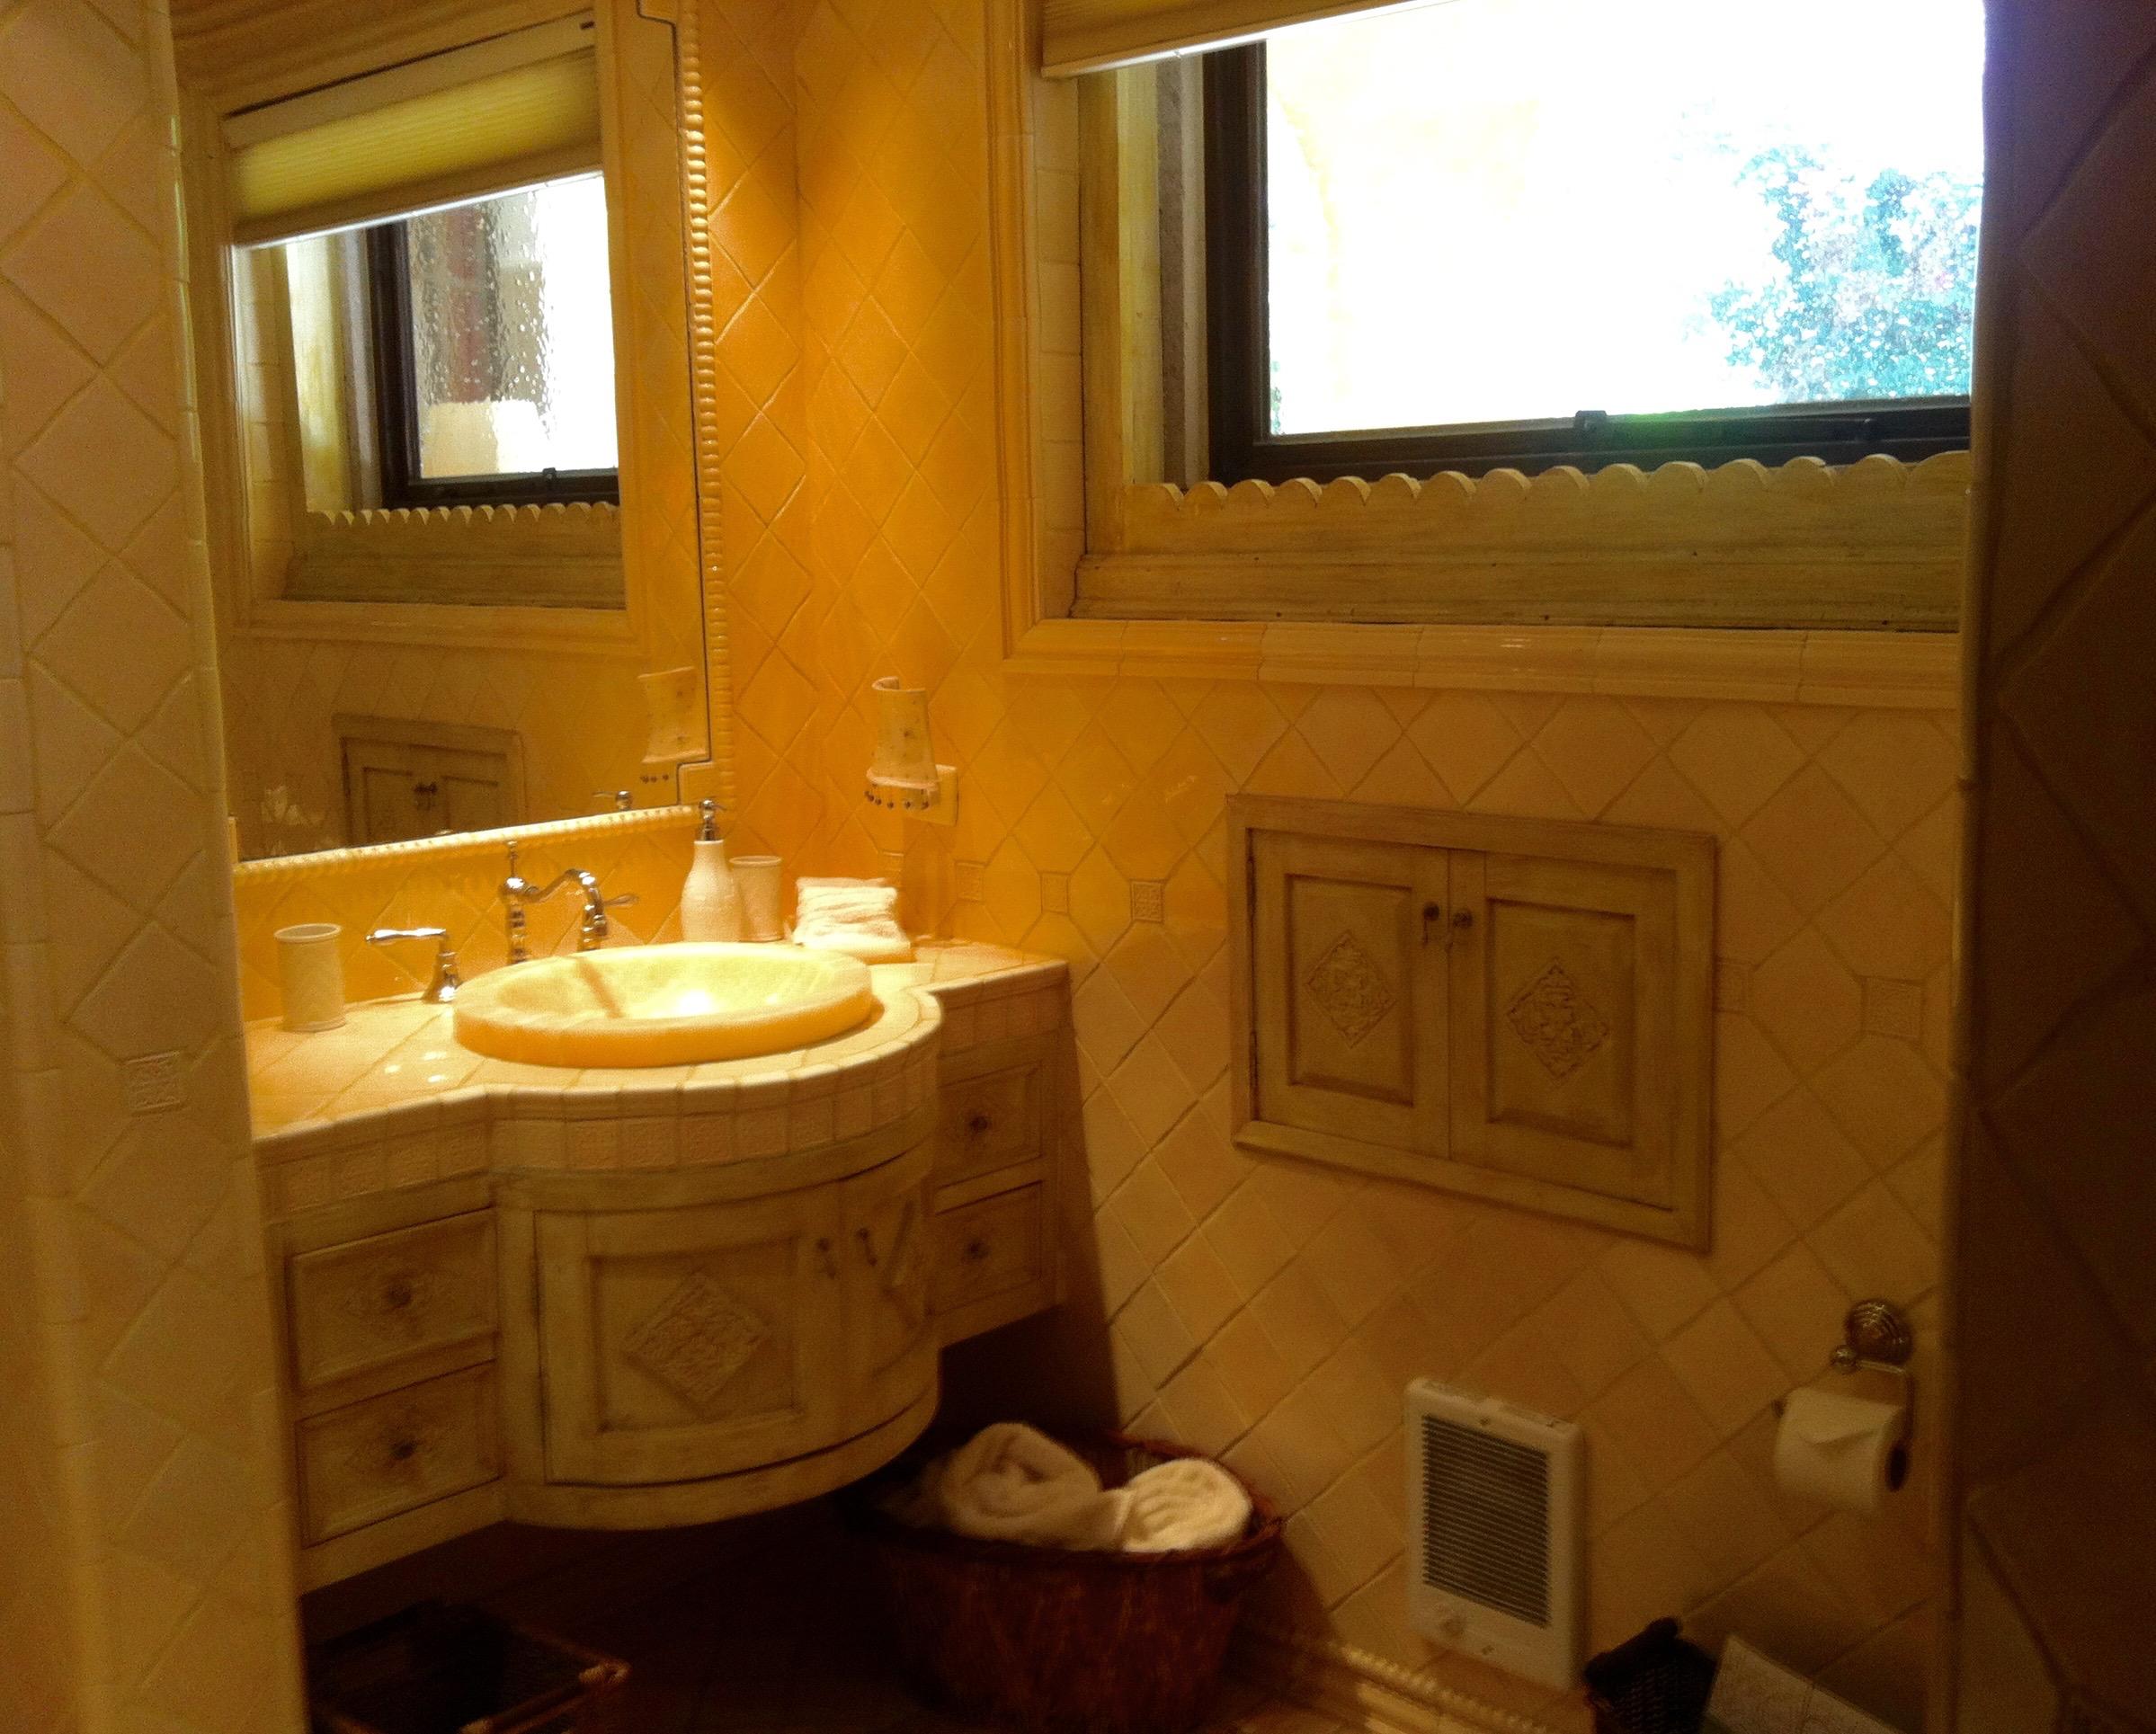 villaclarabella_17 guest bath 1st fl